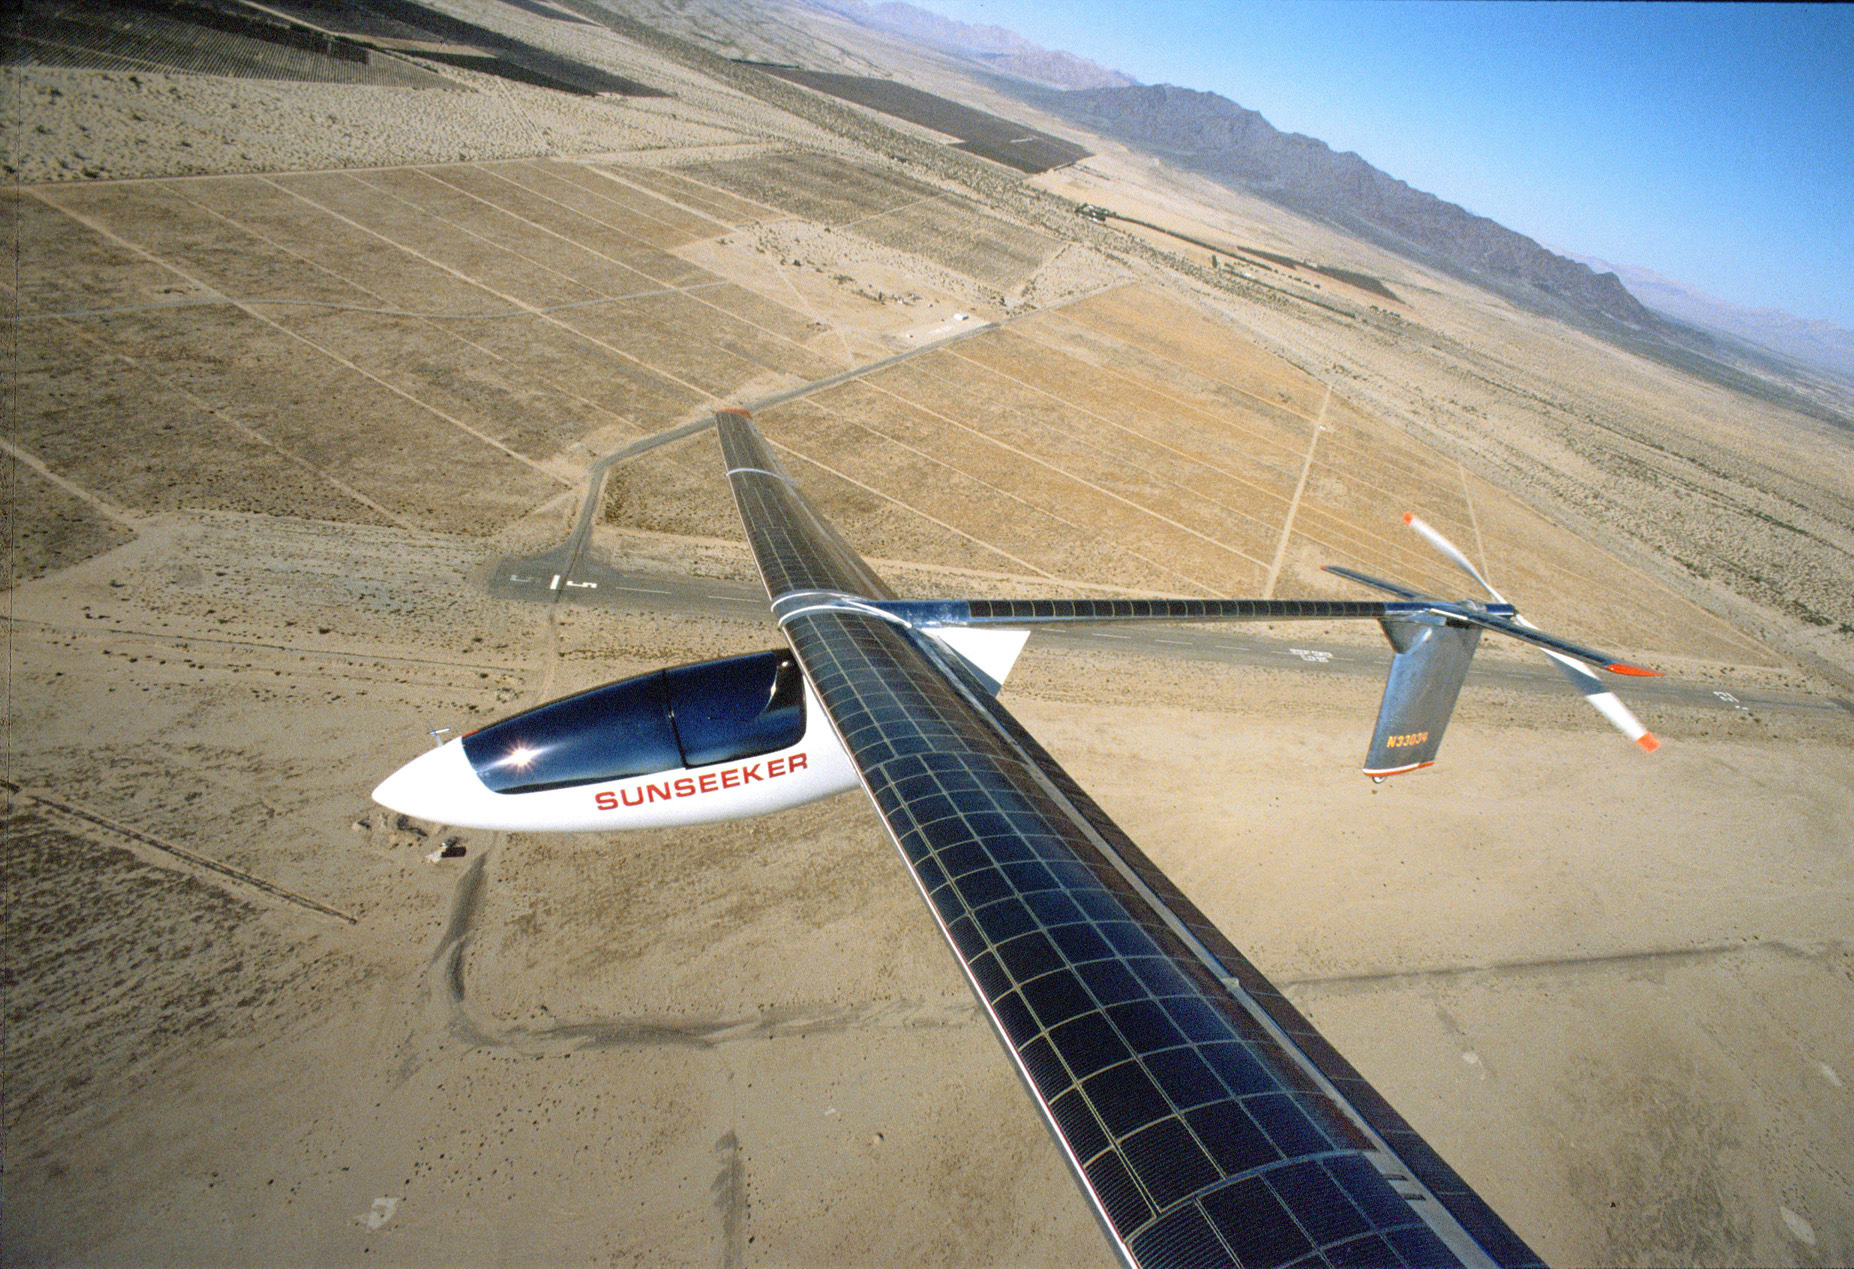 Solárne lietadlo / Skydweller